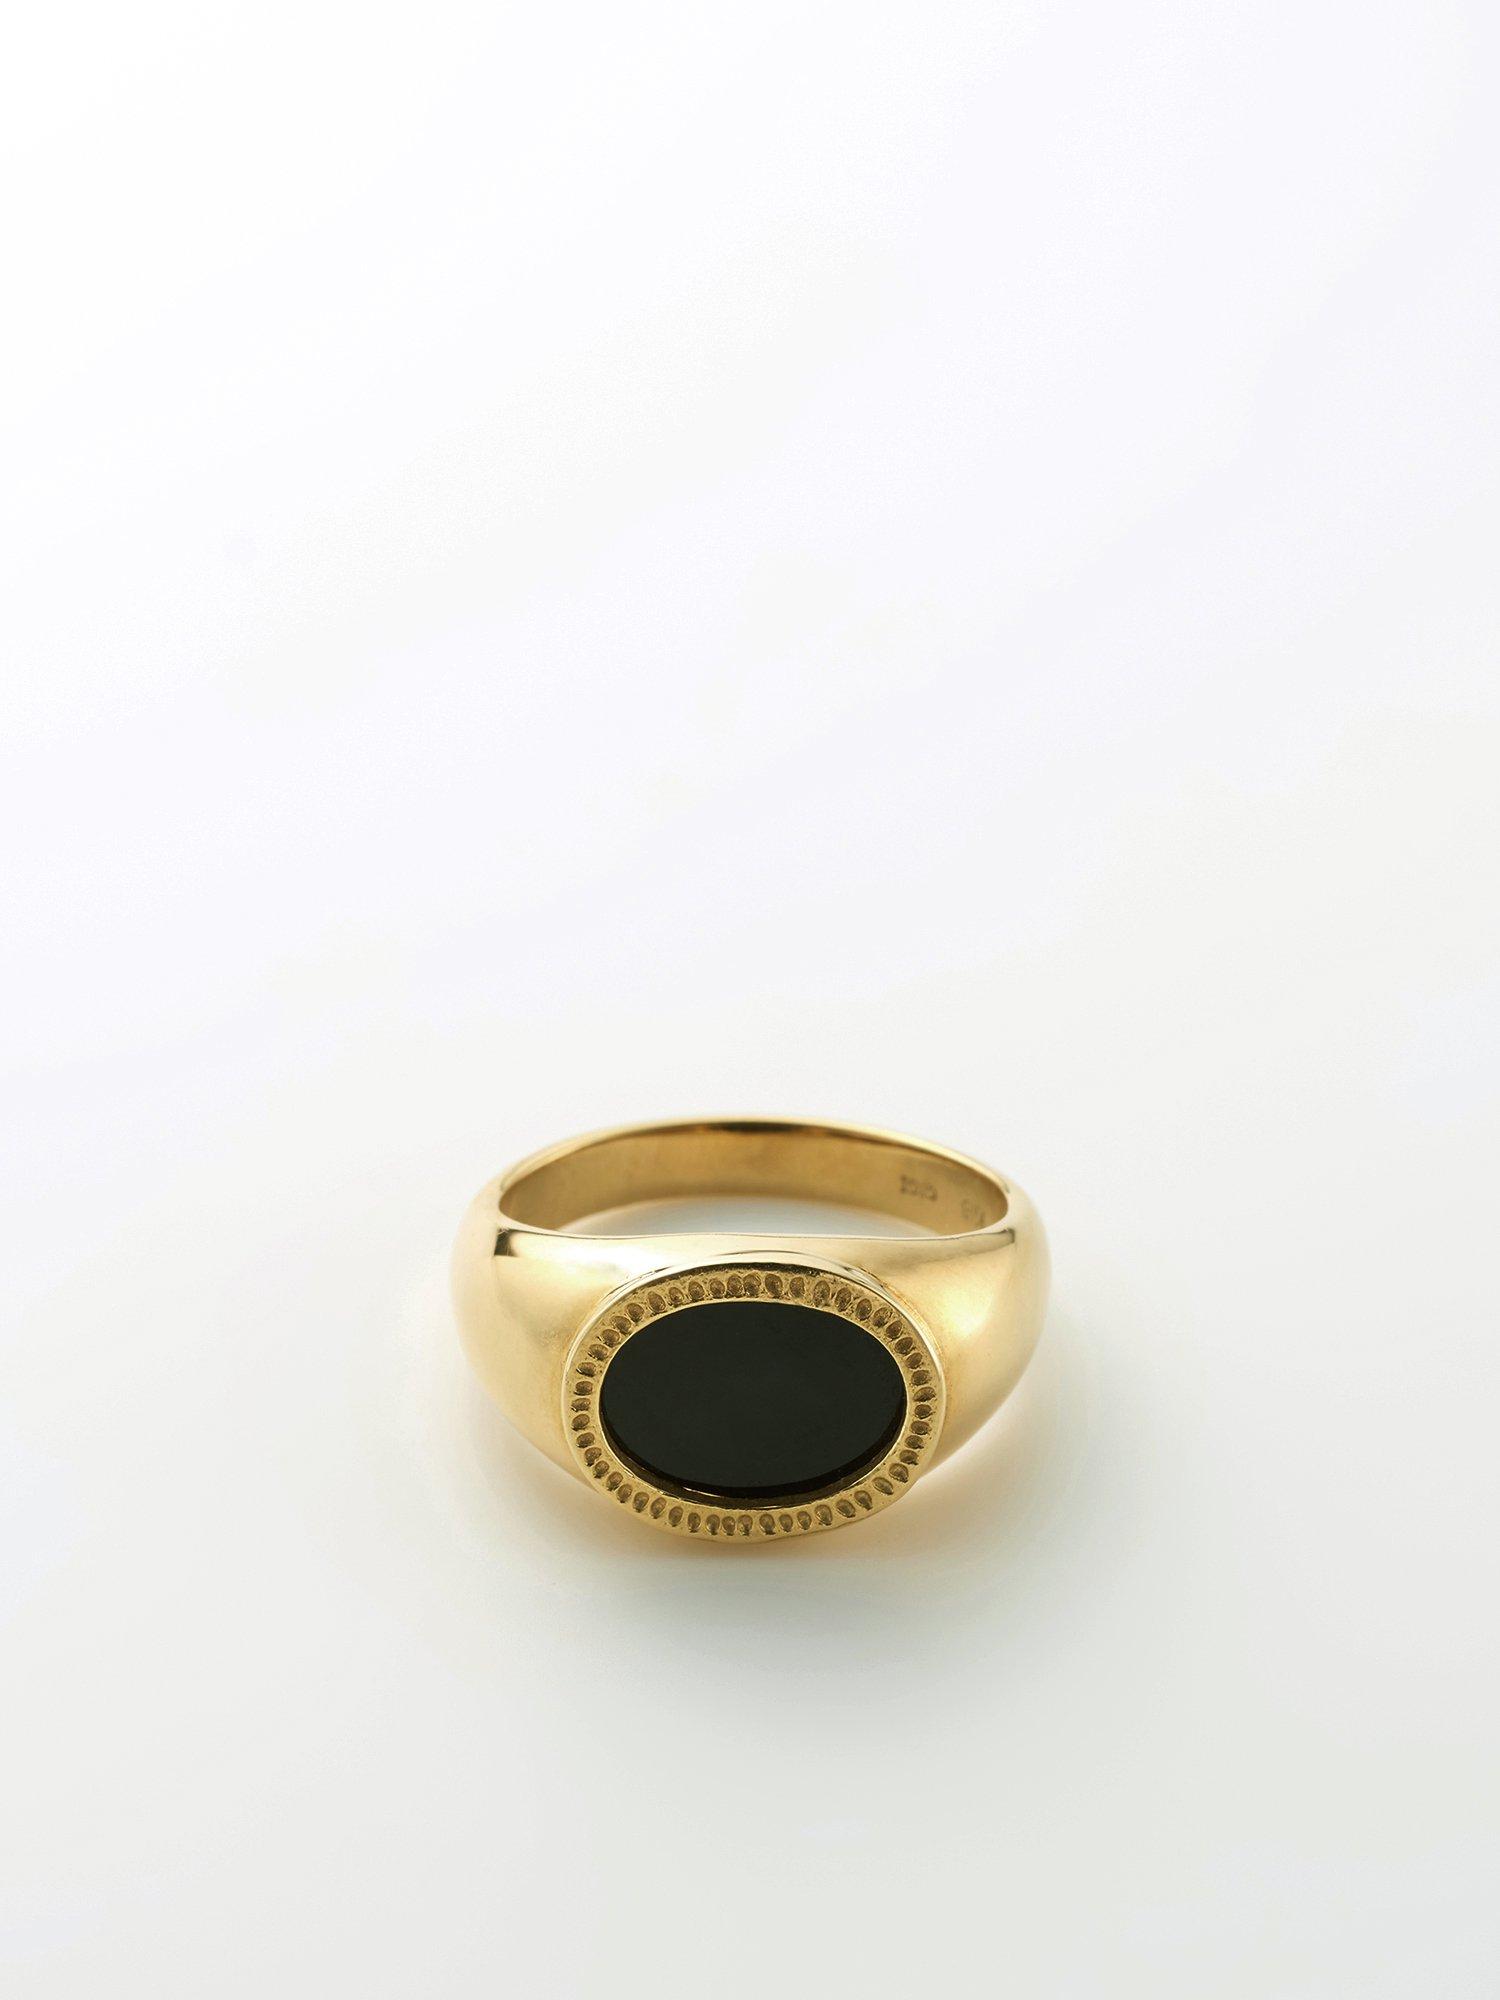 HELIOS / Onix signet ring